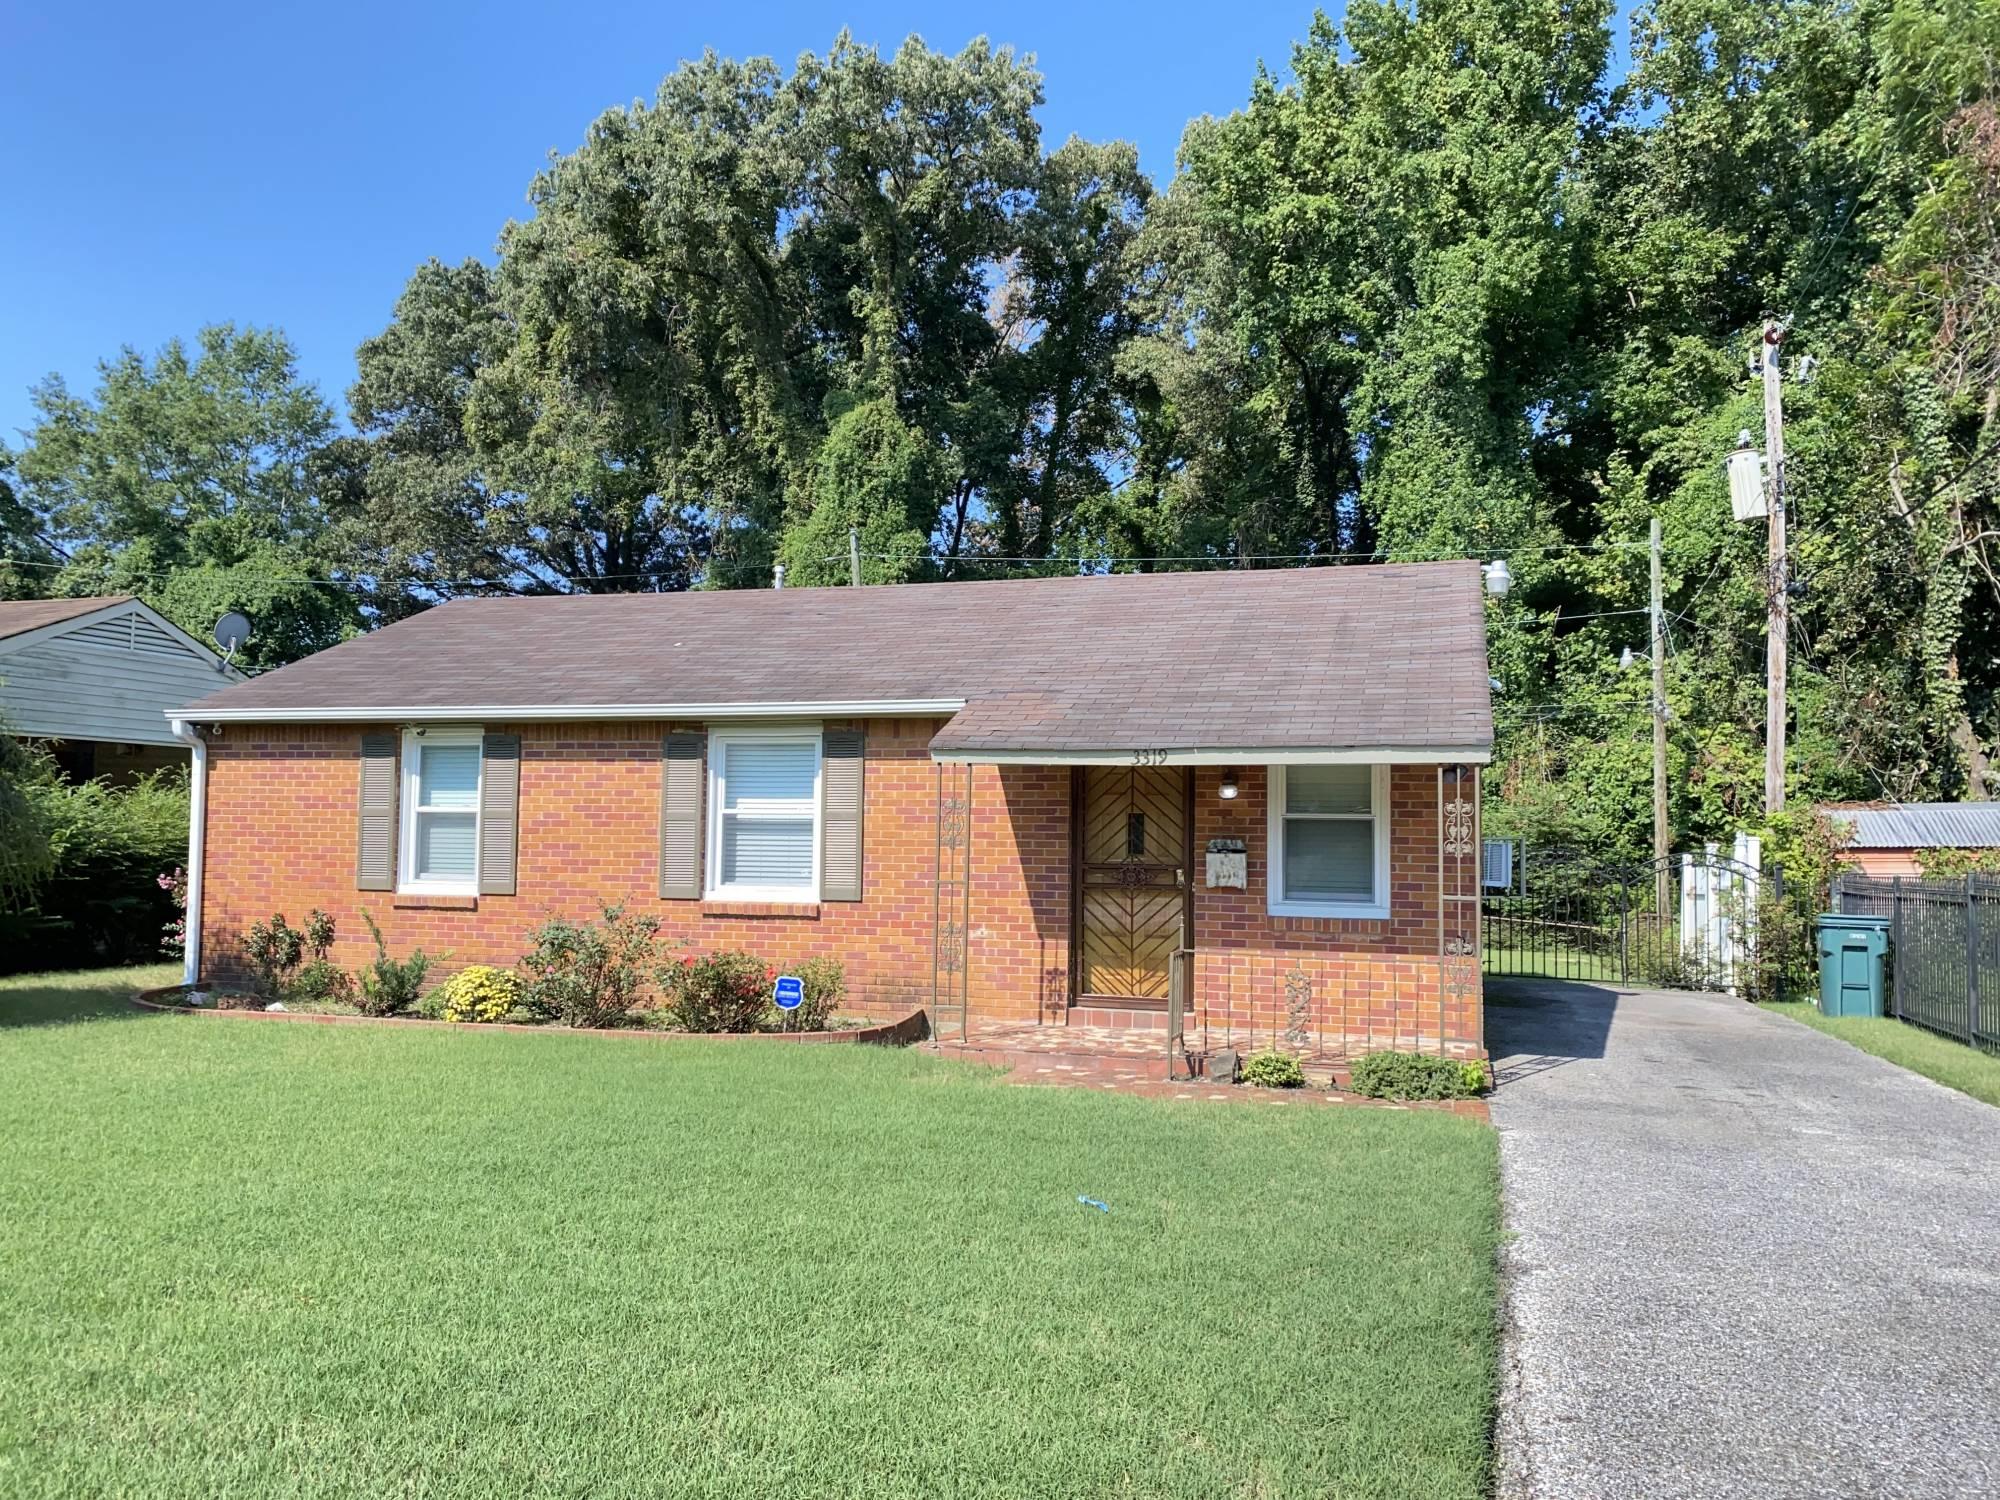 3319 Fostoria Rd. Memphis TN 38109